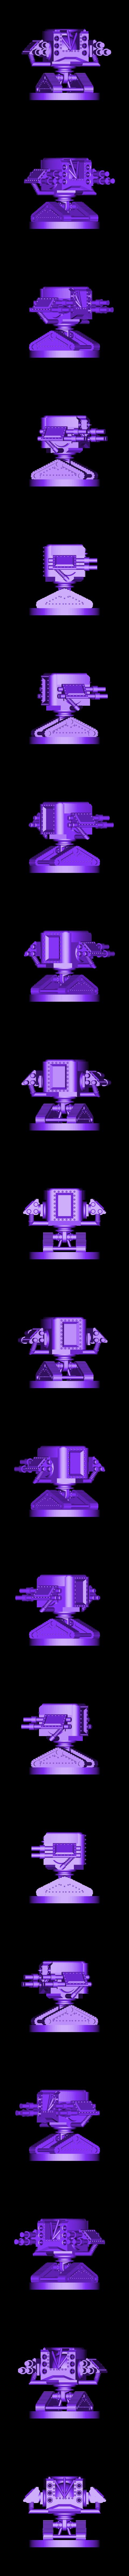 Scythe Tank Mech.stl Download STL file Scythe Tank Mech • 3D printing design, benwax10